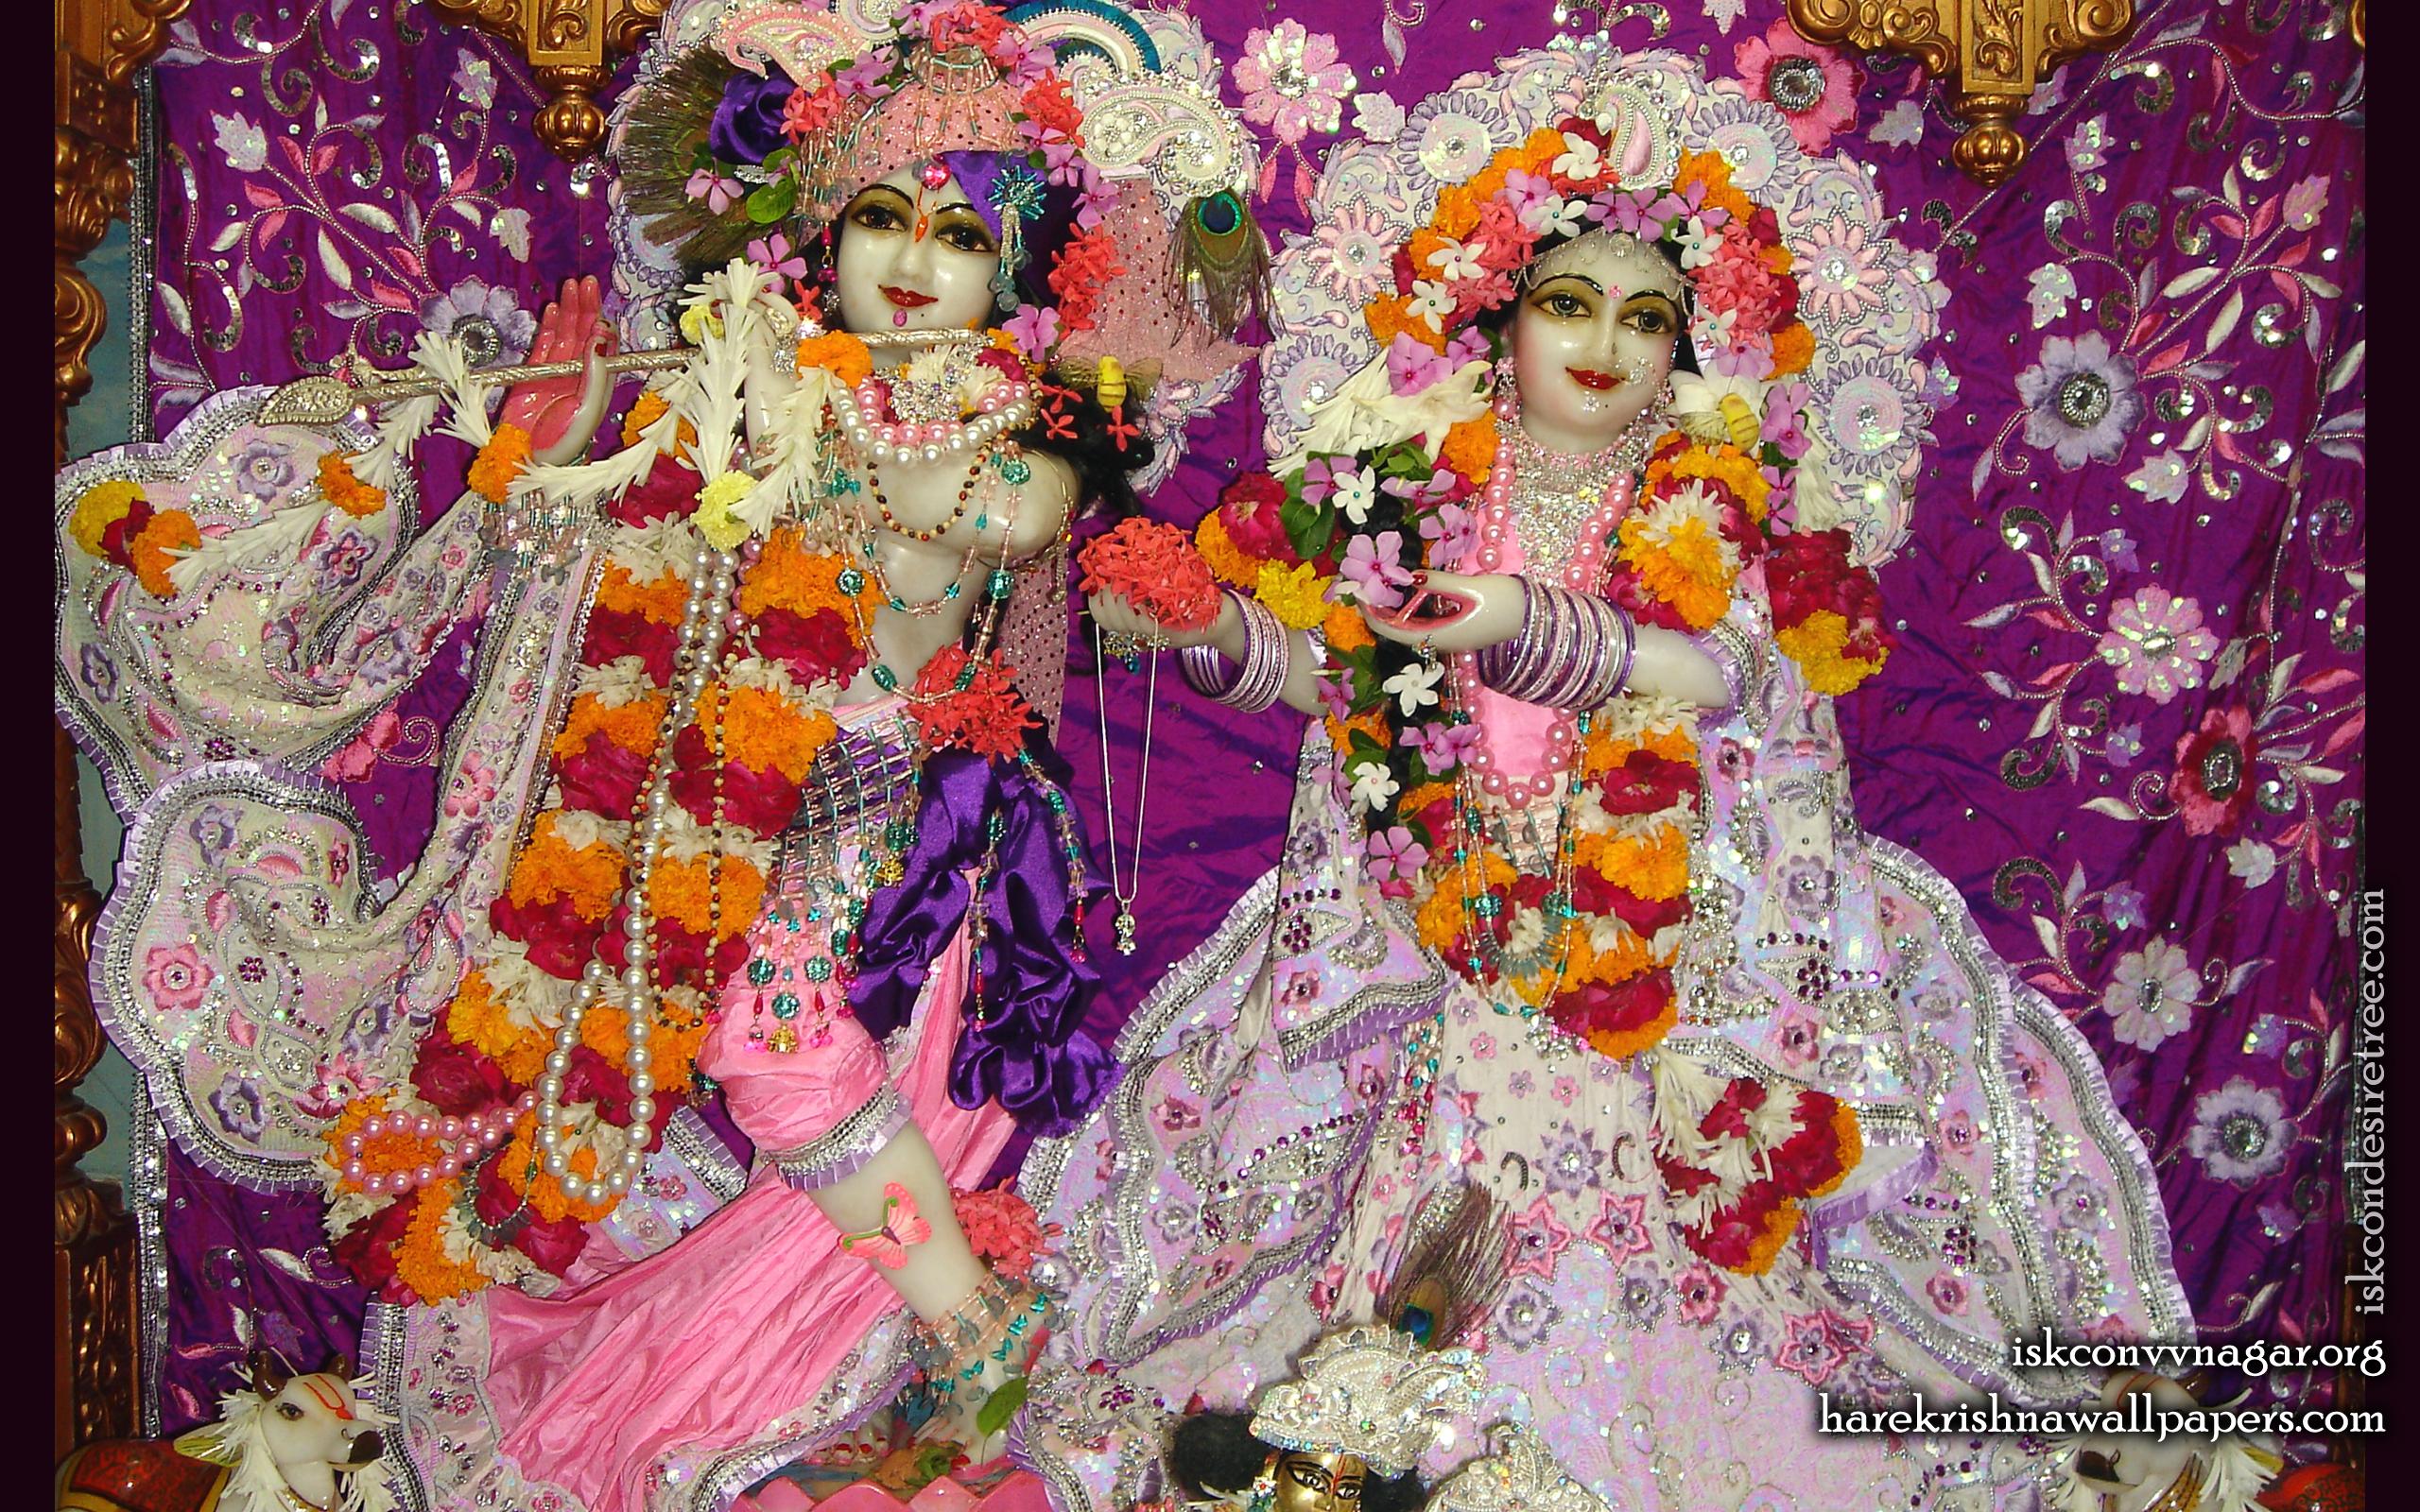 Sri Sri Radha Giridhari Wallpaper (014) Size 2560x1600 Download